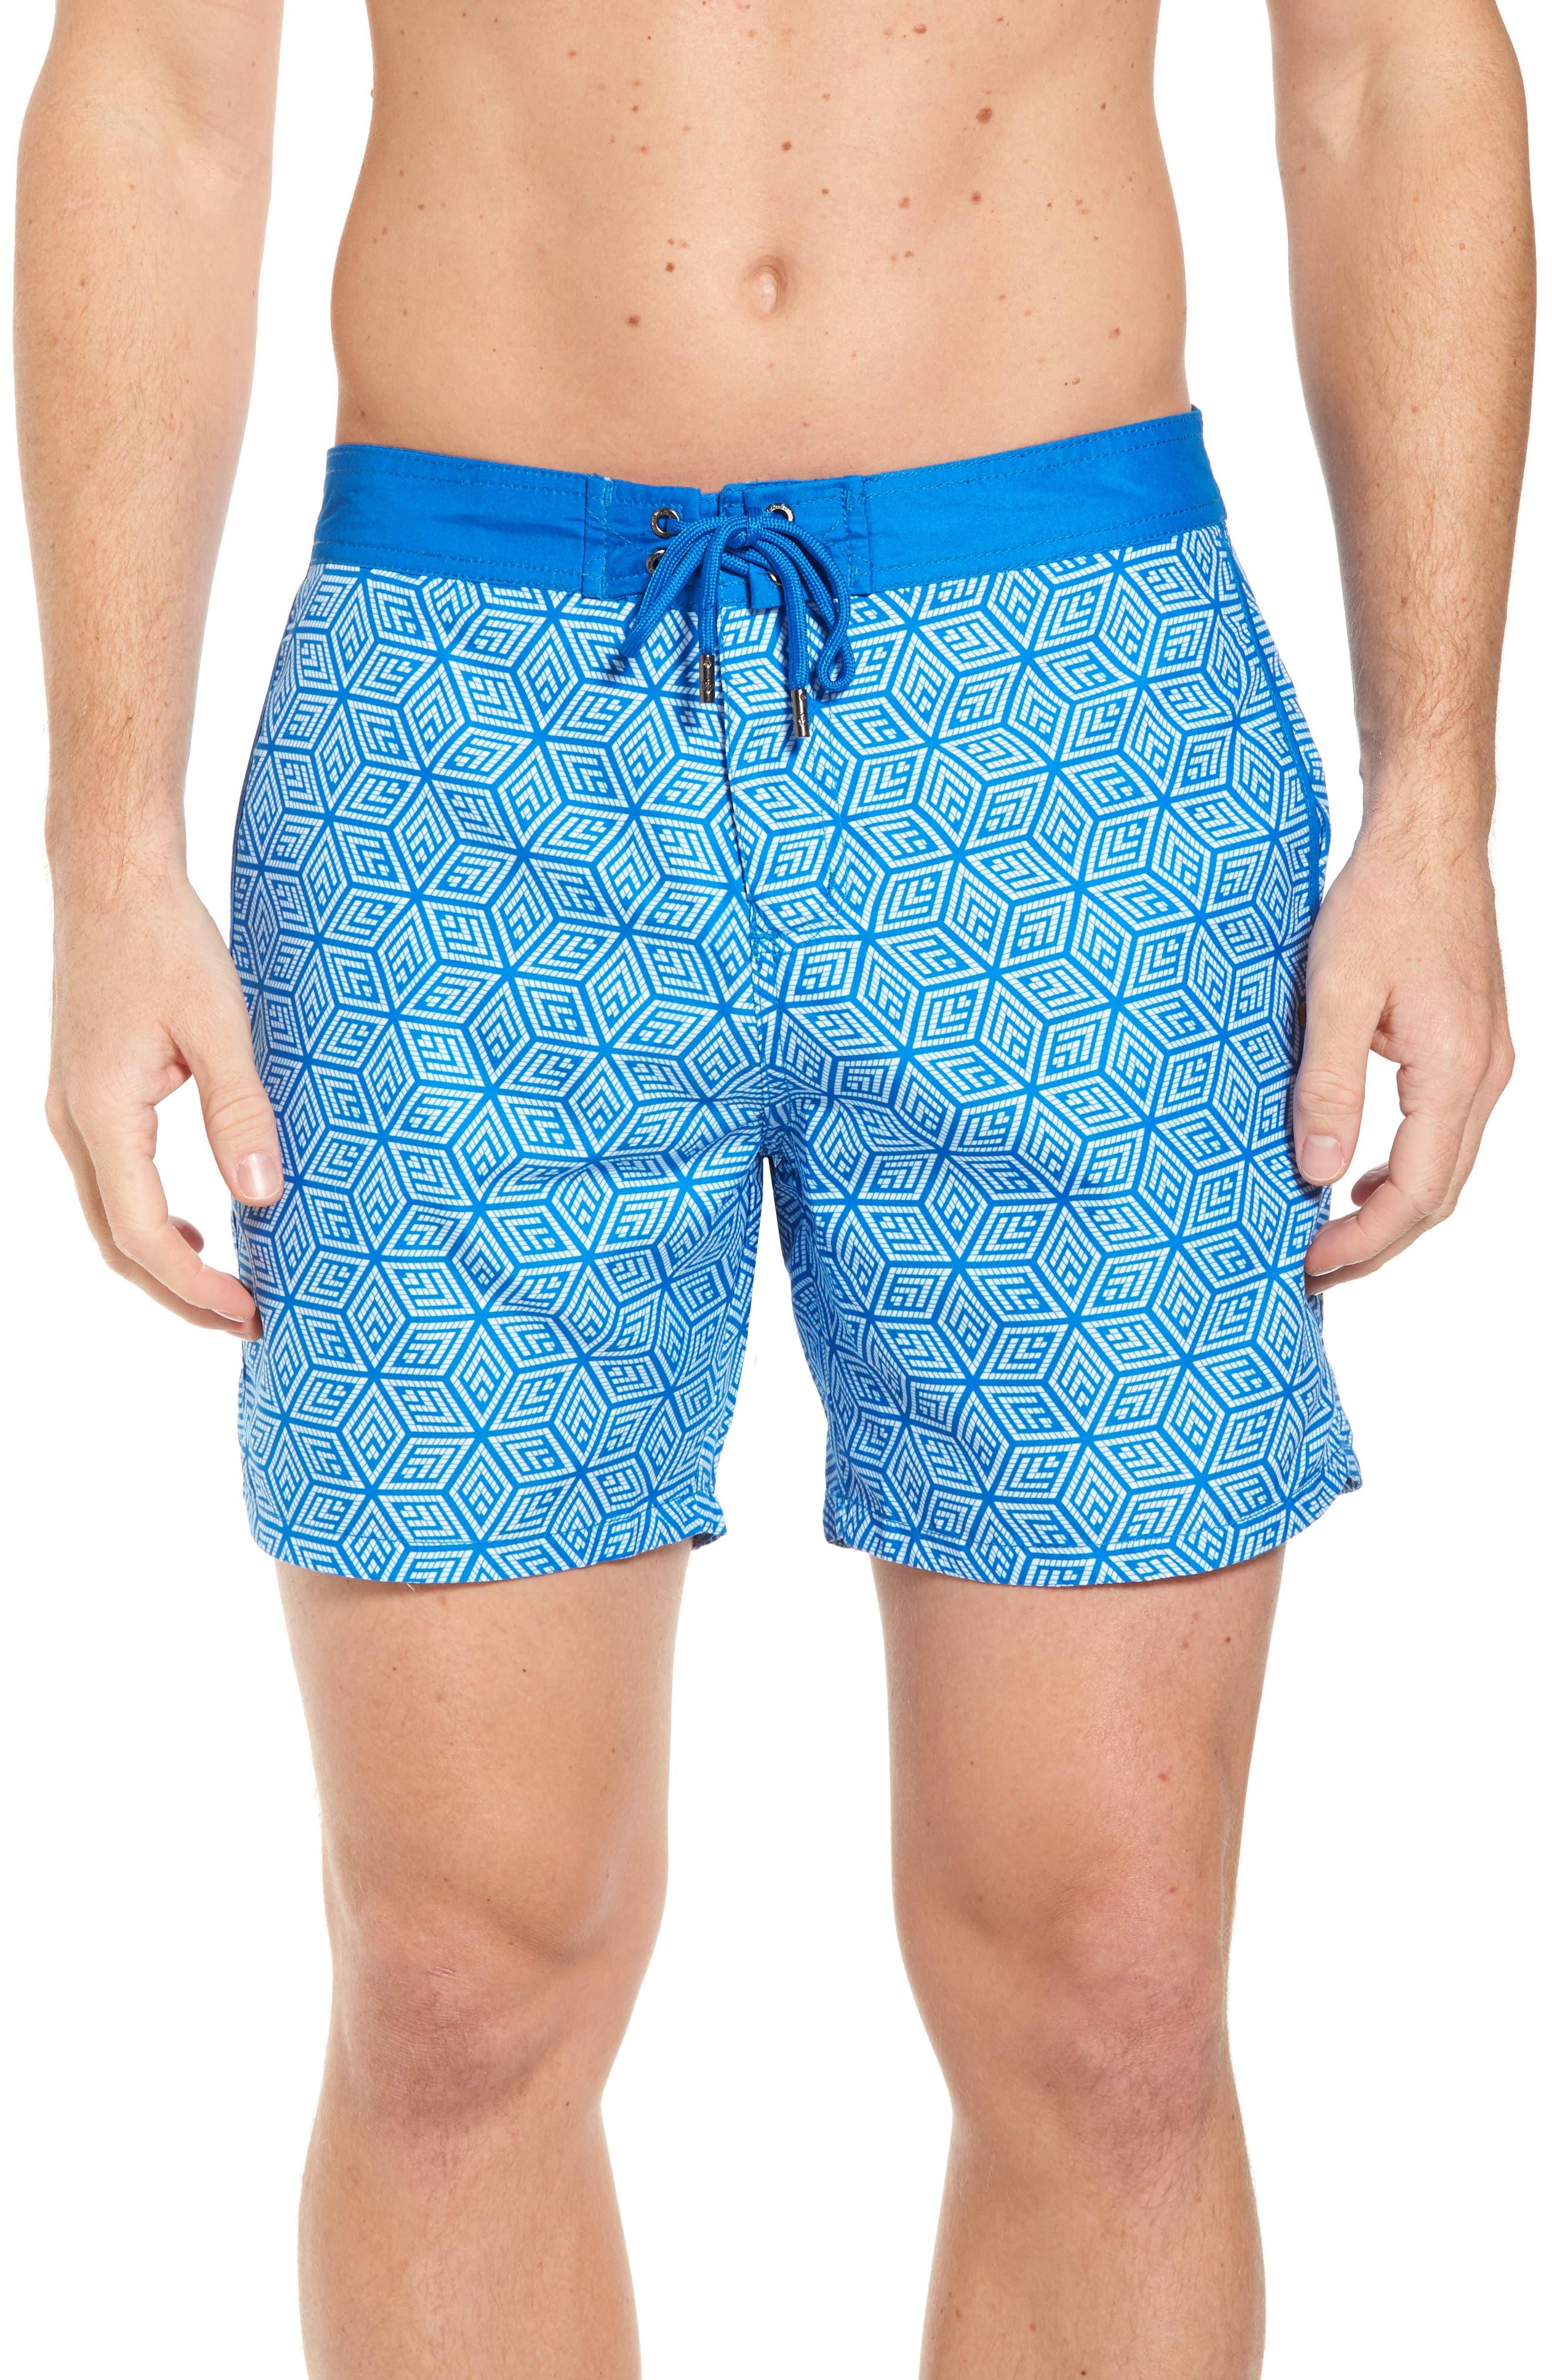 Mr. Swim Geo Print Swim Trunks,                         Main,                         color, Blue